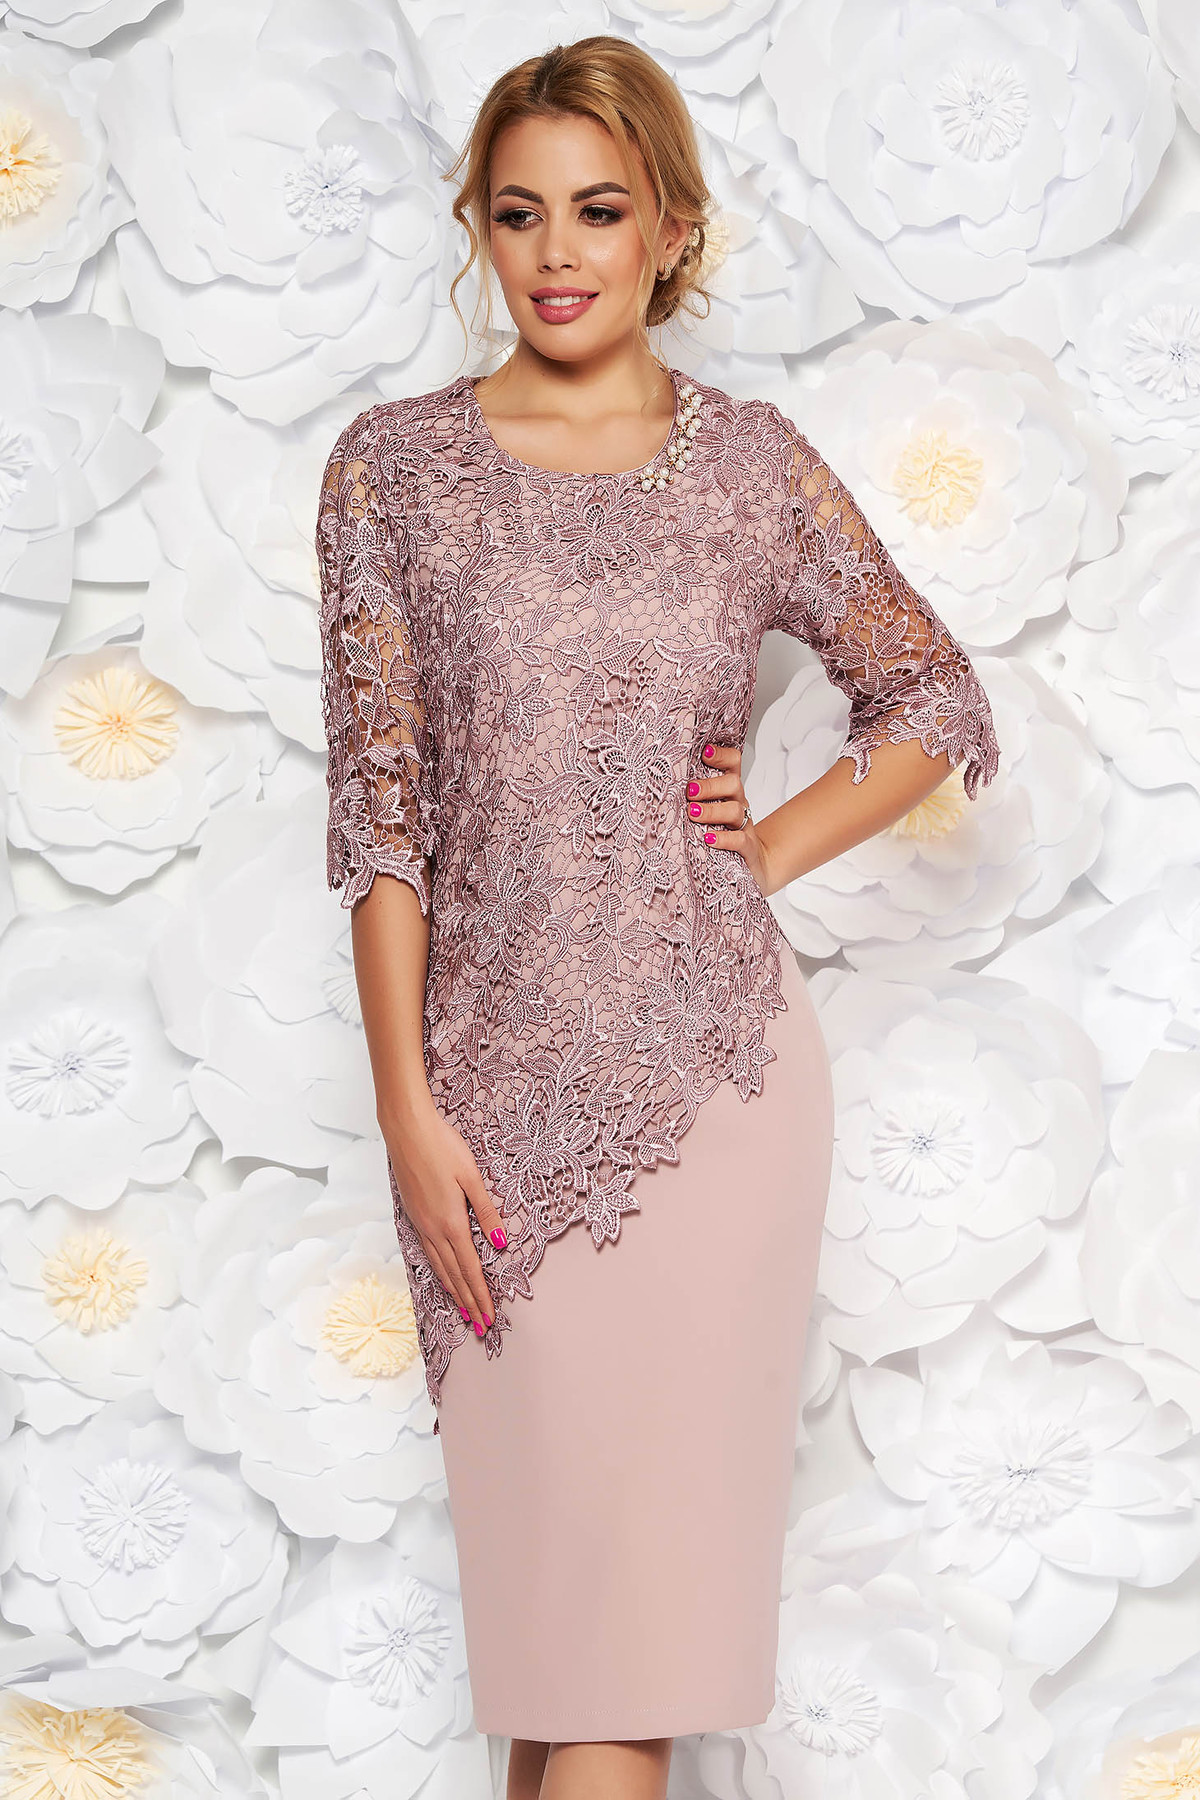 Rochie rosa de ocazie midi cu maneca 3/4 cu un croi mulat din stofa usor elastica suprapunere cu dantela